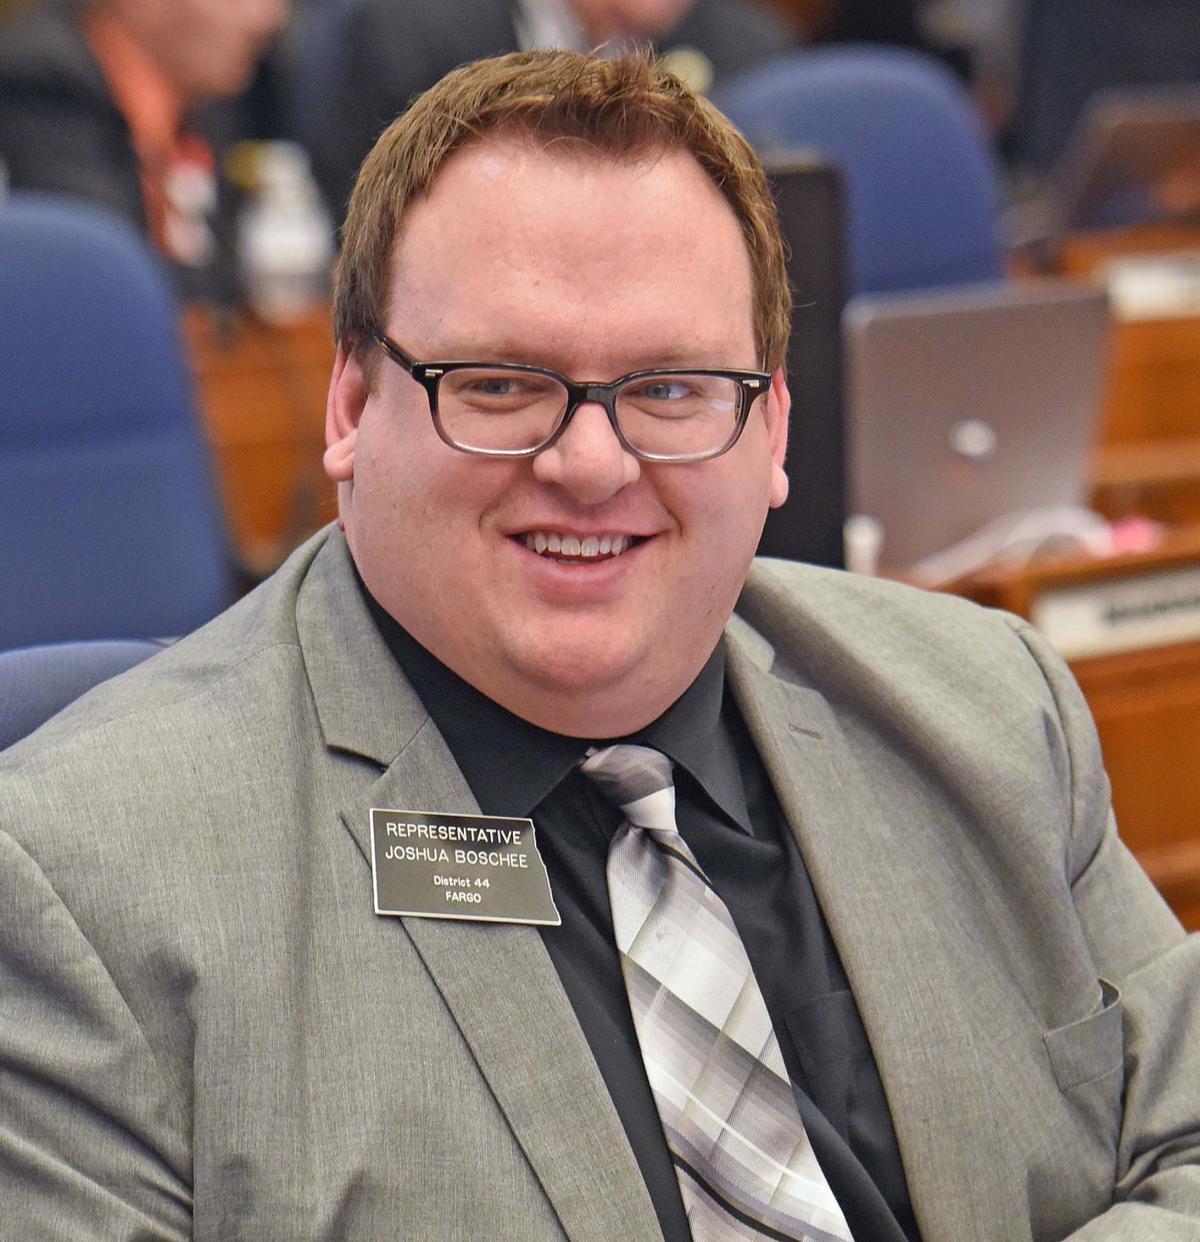 Rep. Joshua Boschee